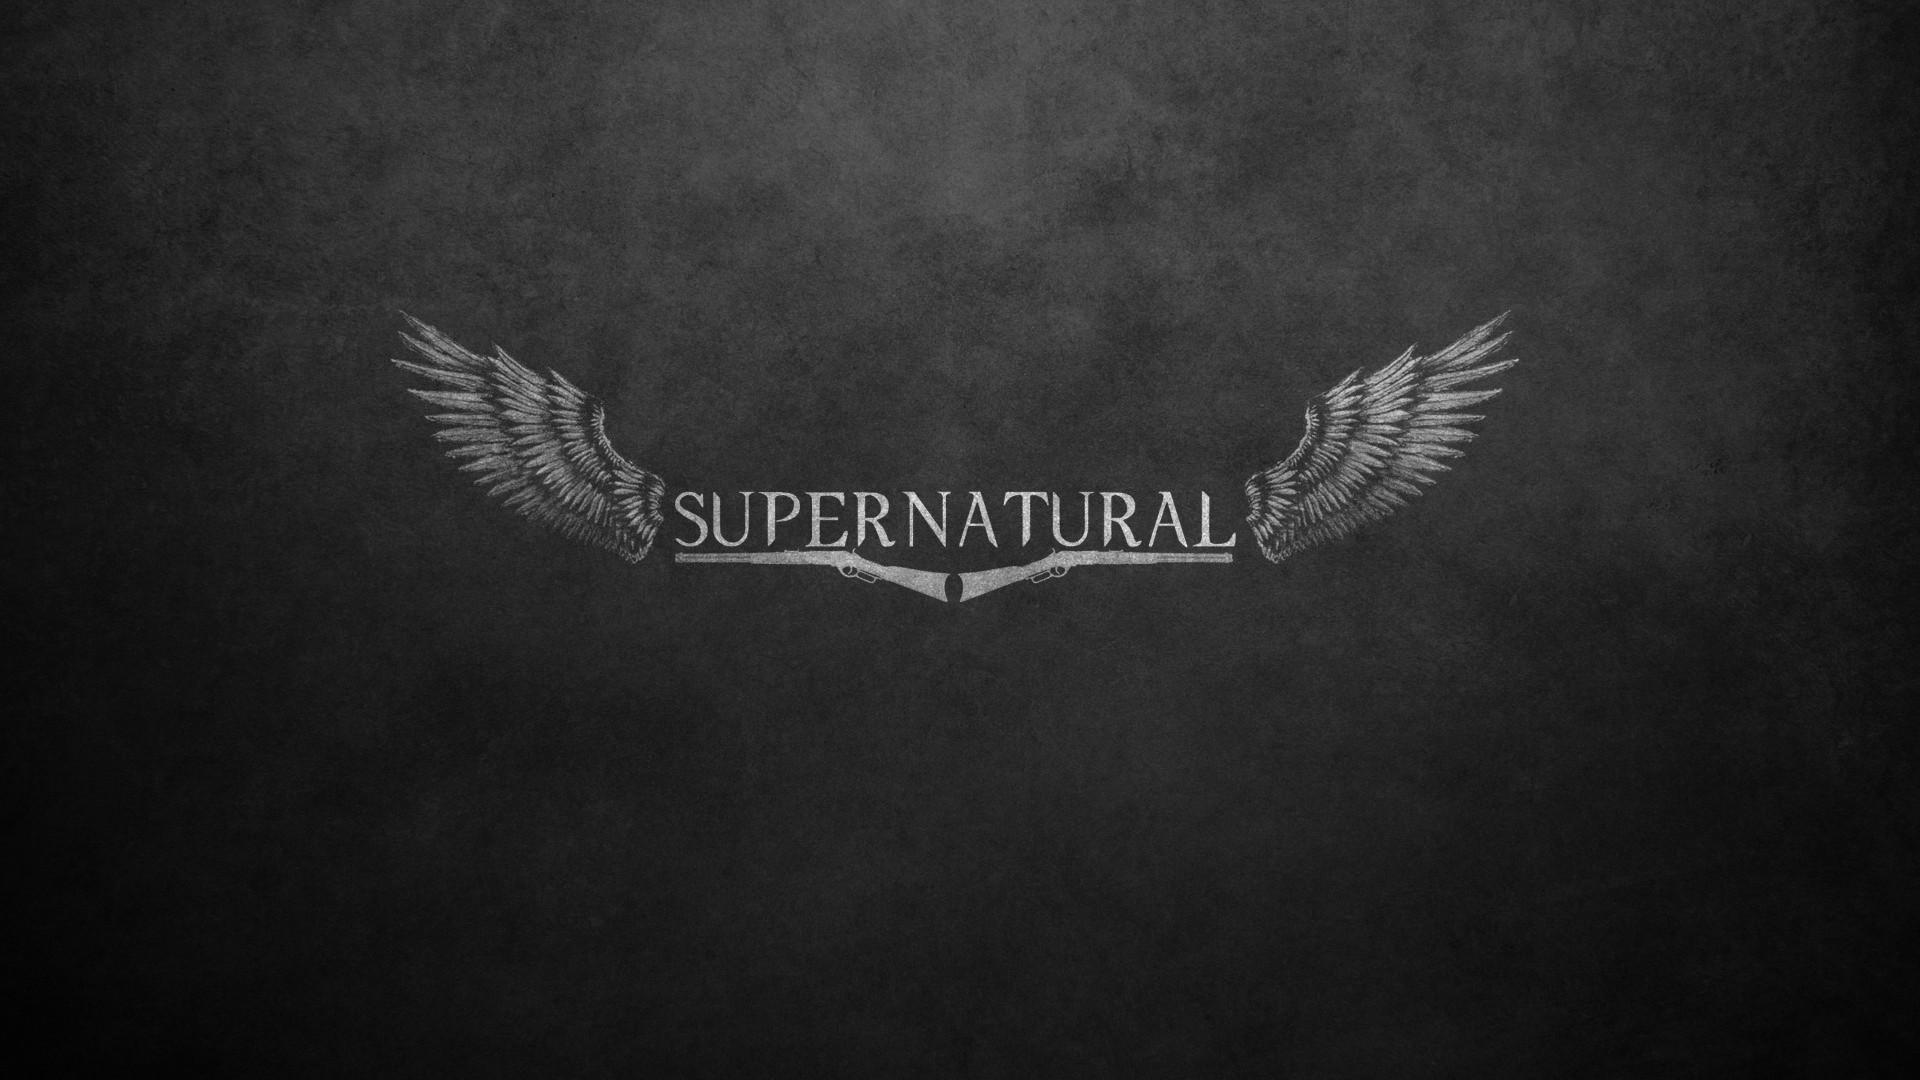 Logo Supernatural Wallpaper Wallpapers Backgrounds Images Art Supernatural Wallpaper Supernatural Twitter Supernatural